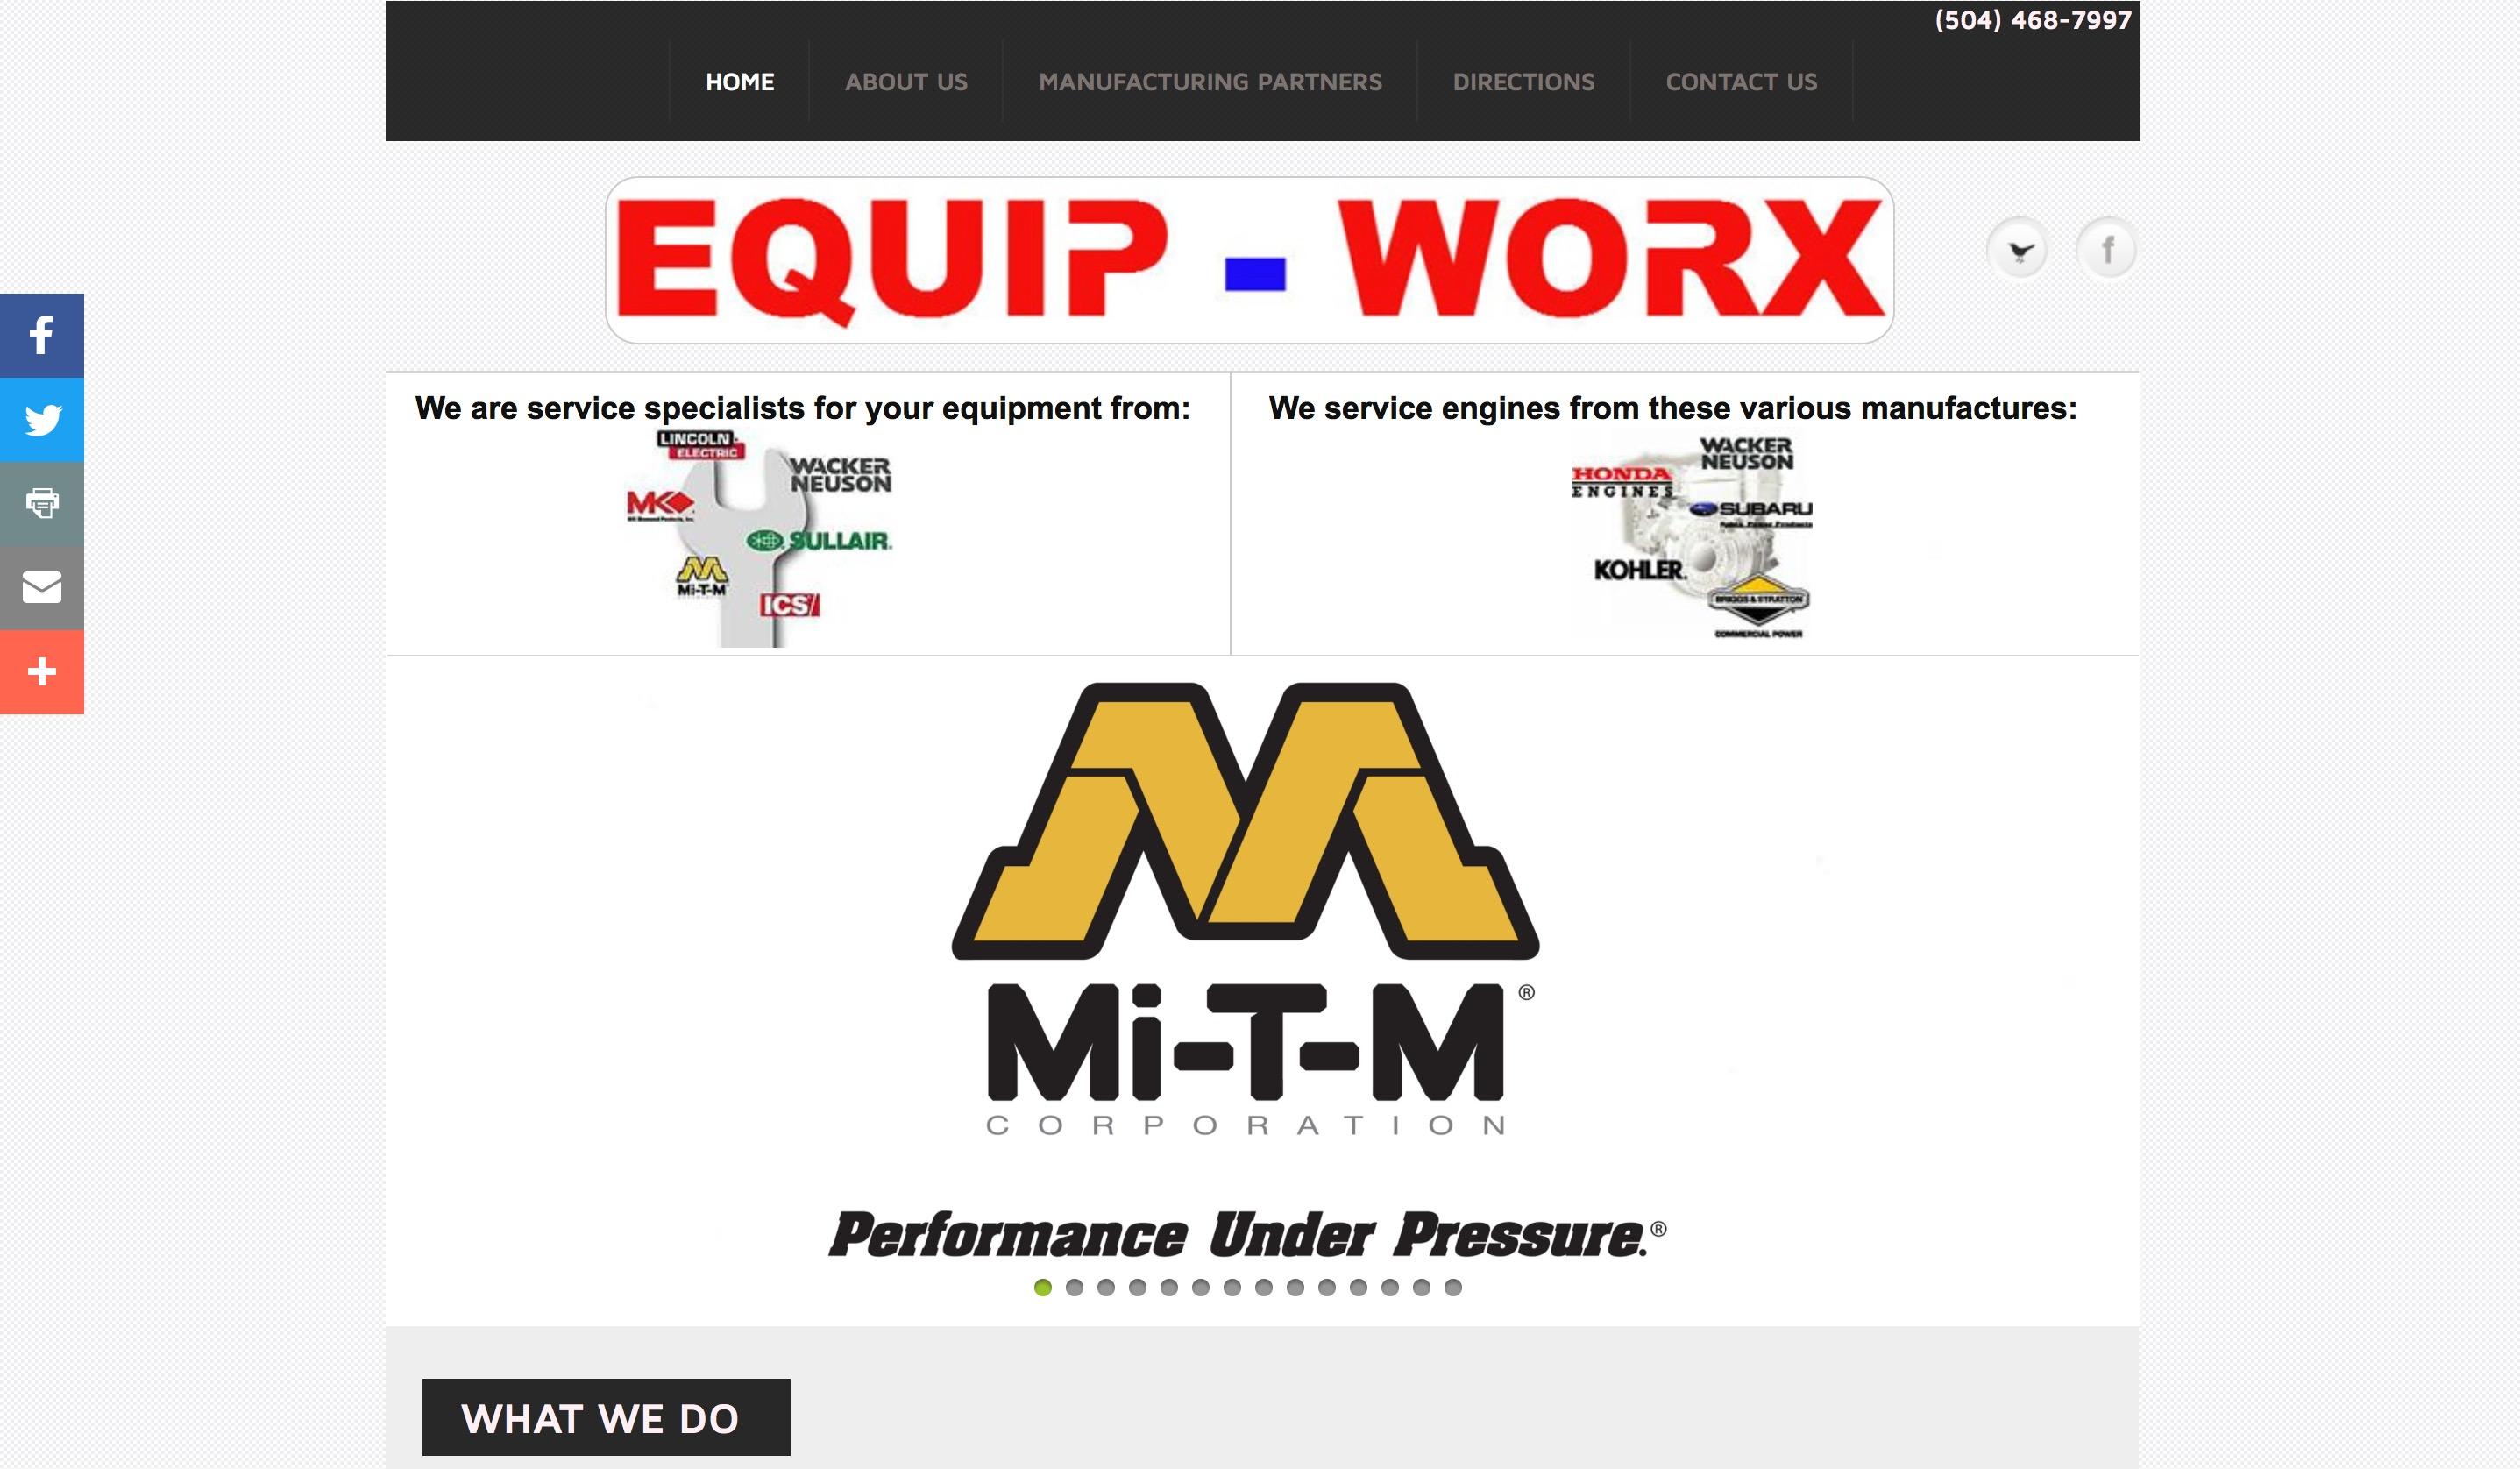 Equip-Worx